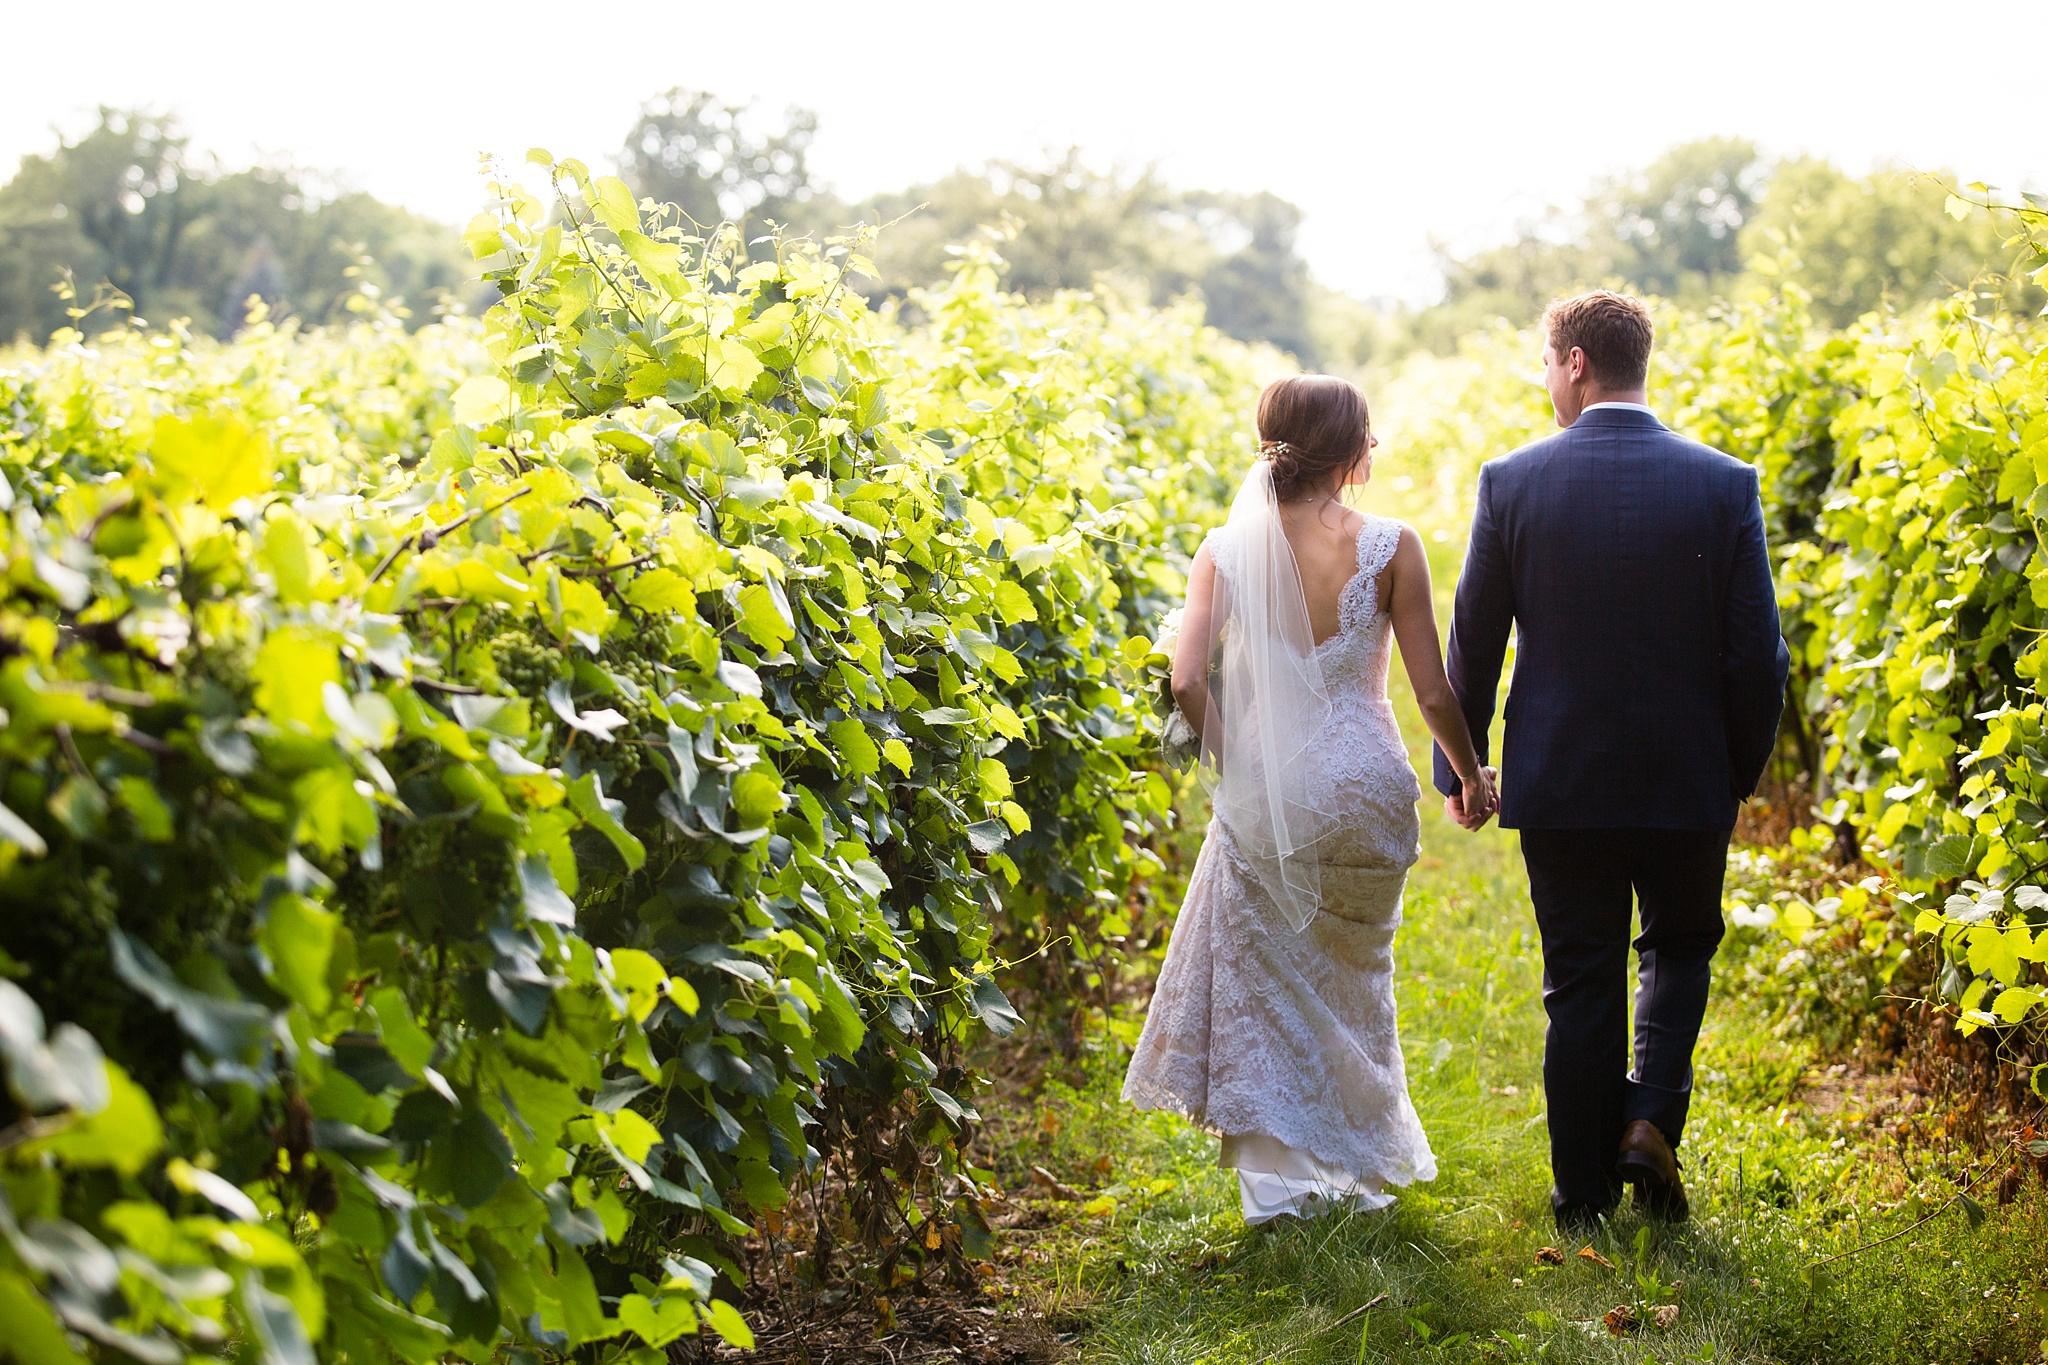 Tim&Polly_Wedding_12CornerVineyard_blog054.jpg